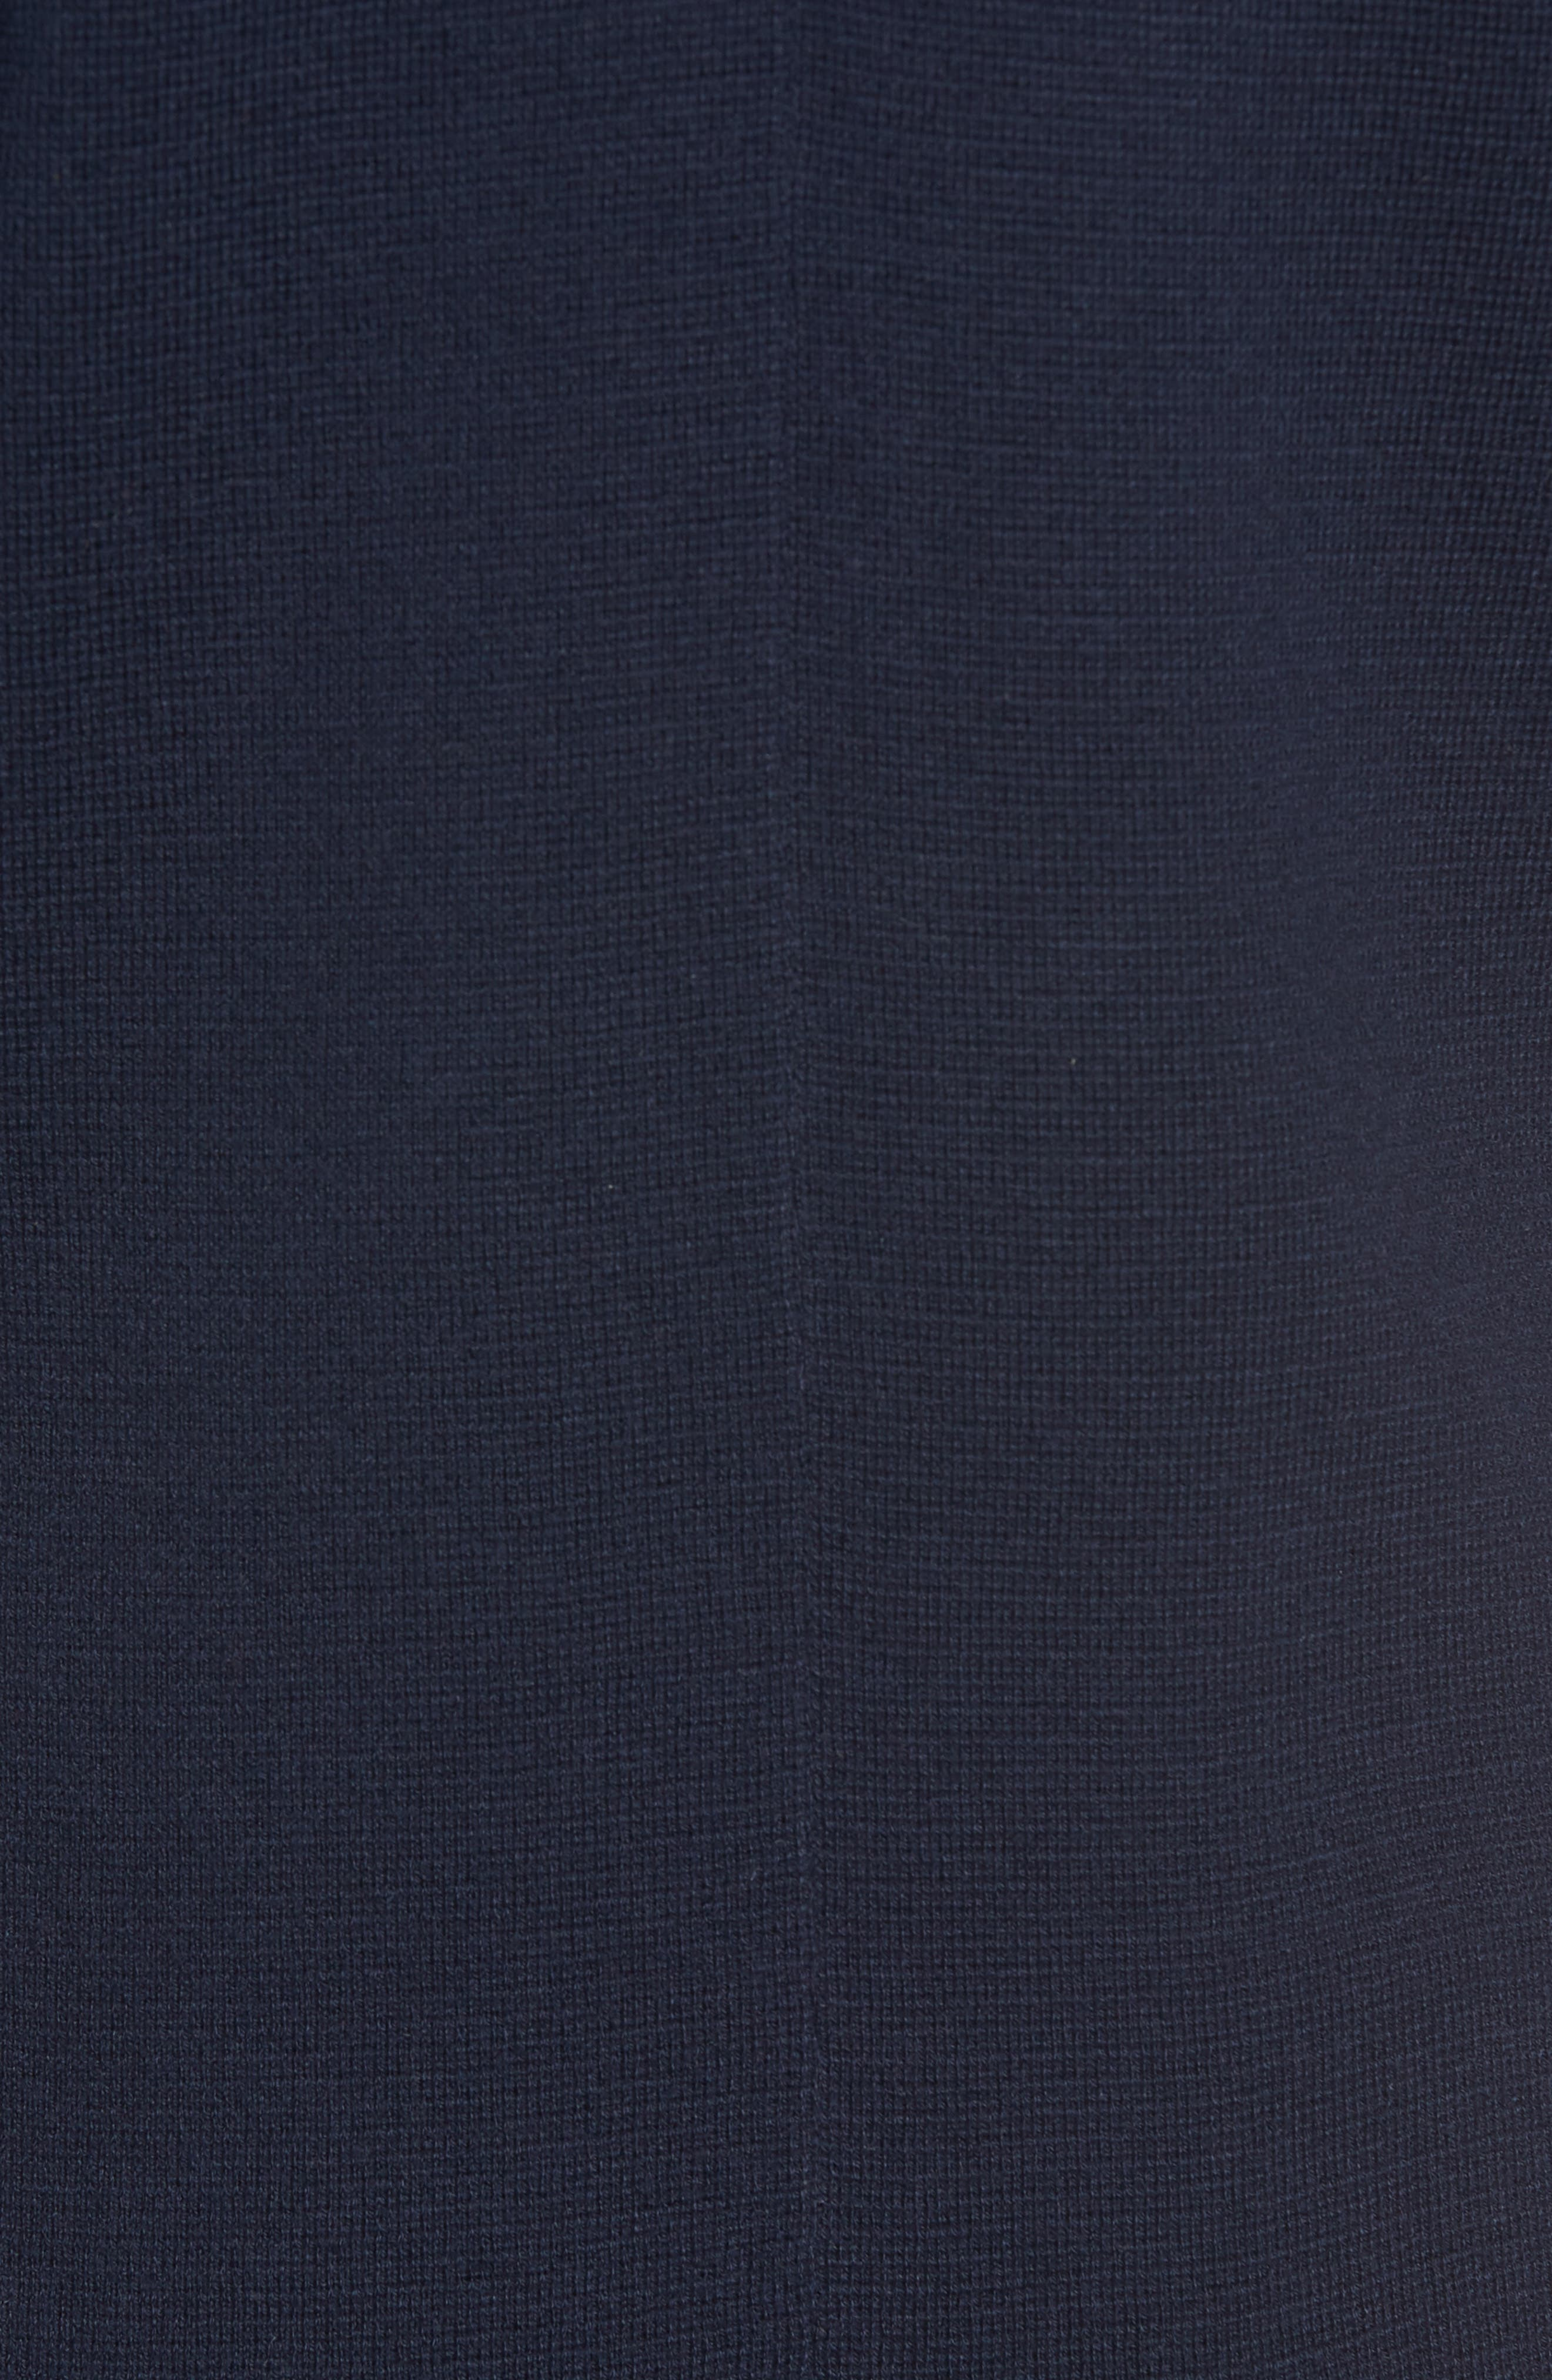 Merino Sweater Blazer,                             Alternate thumbnail 7, color,                             NAVY